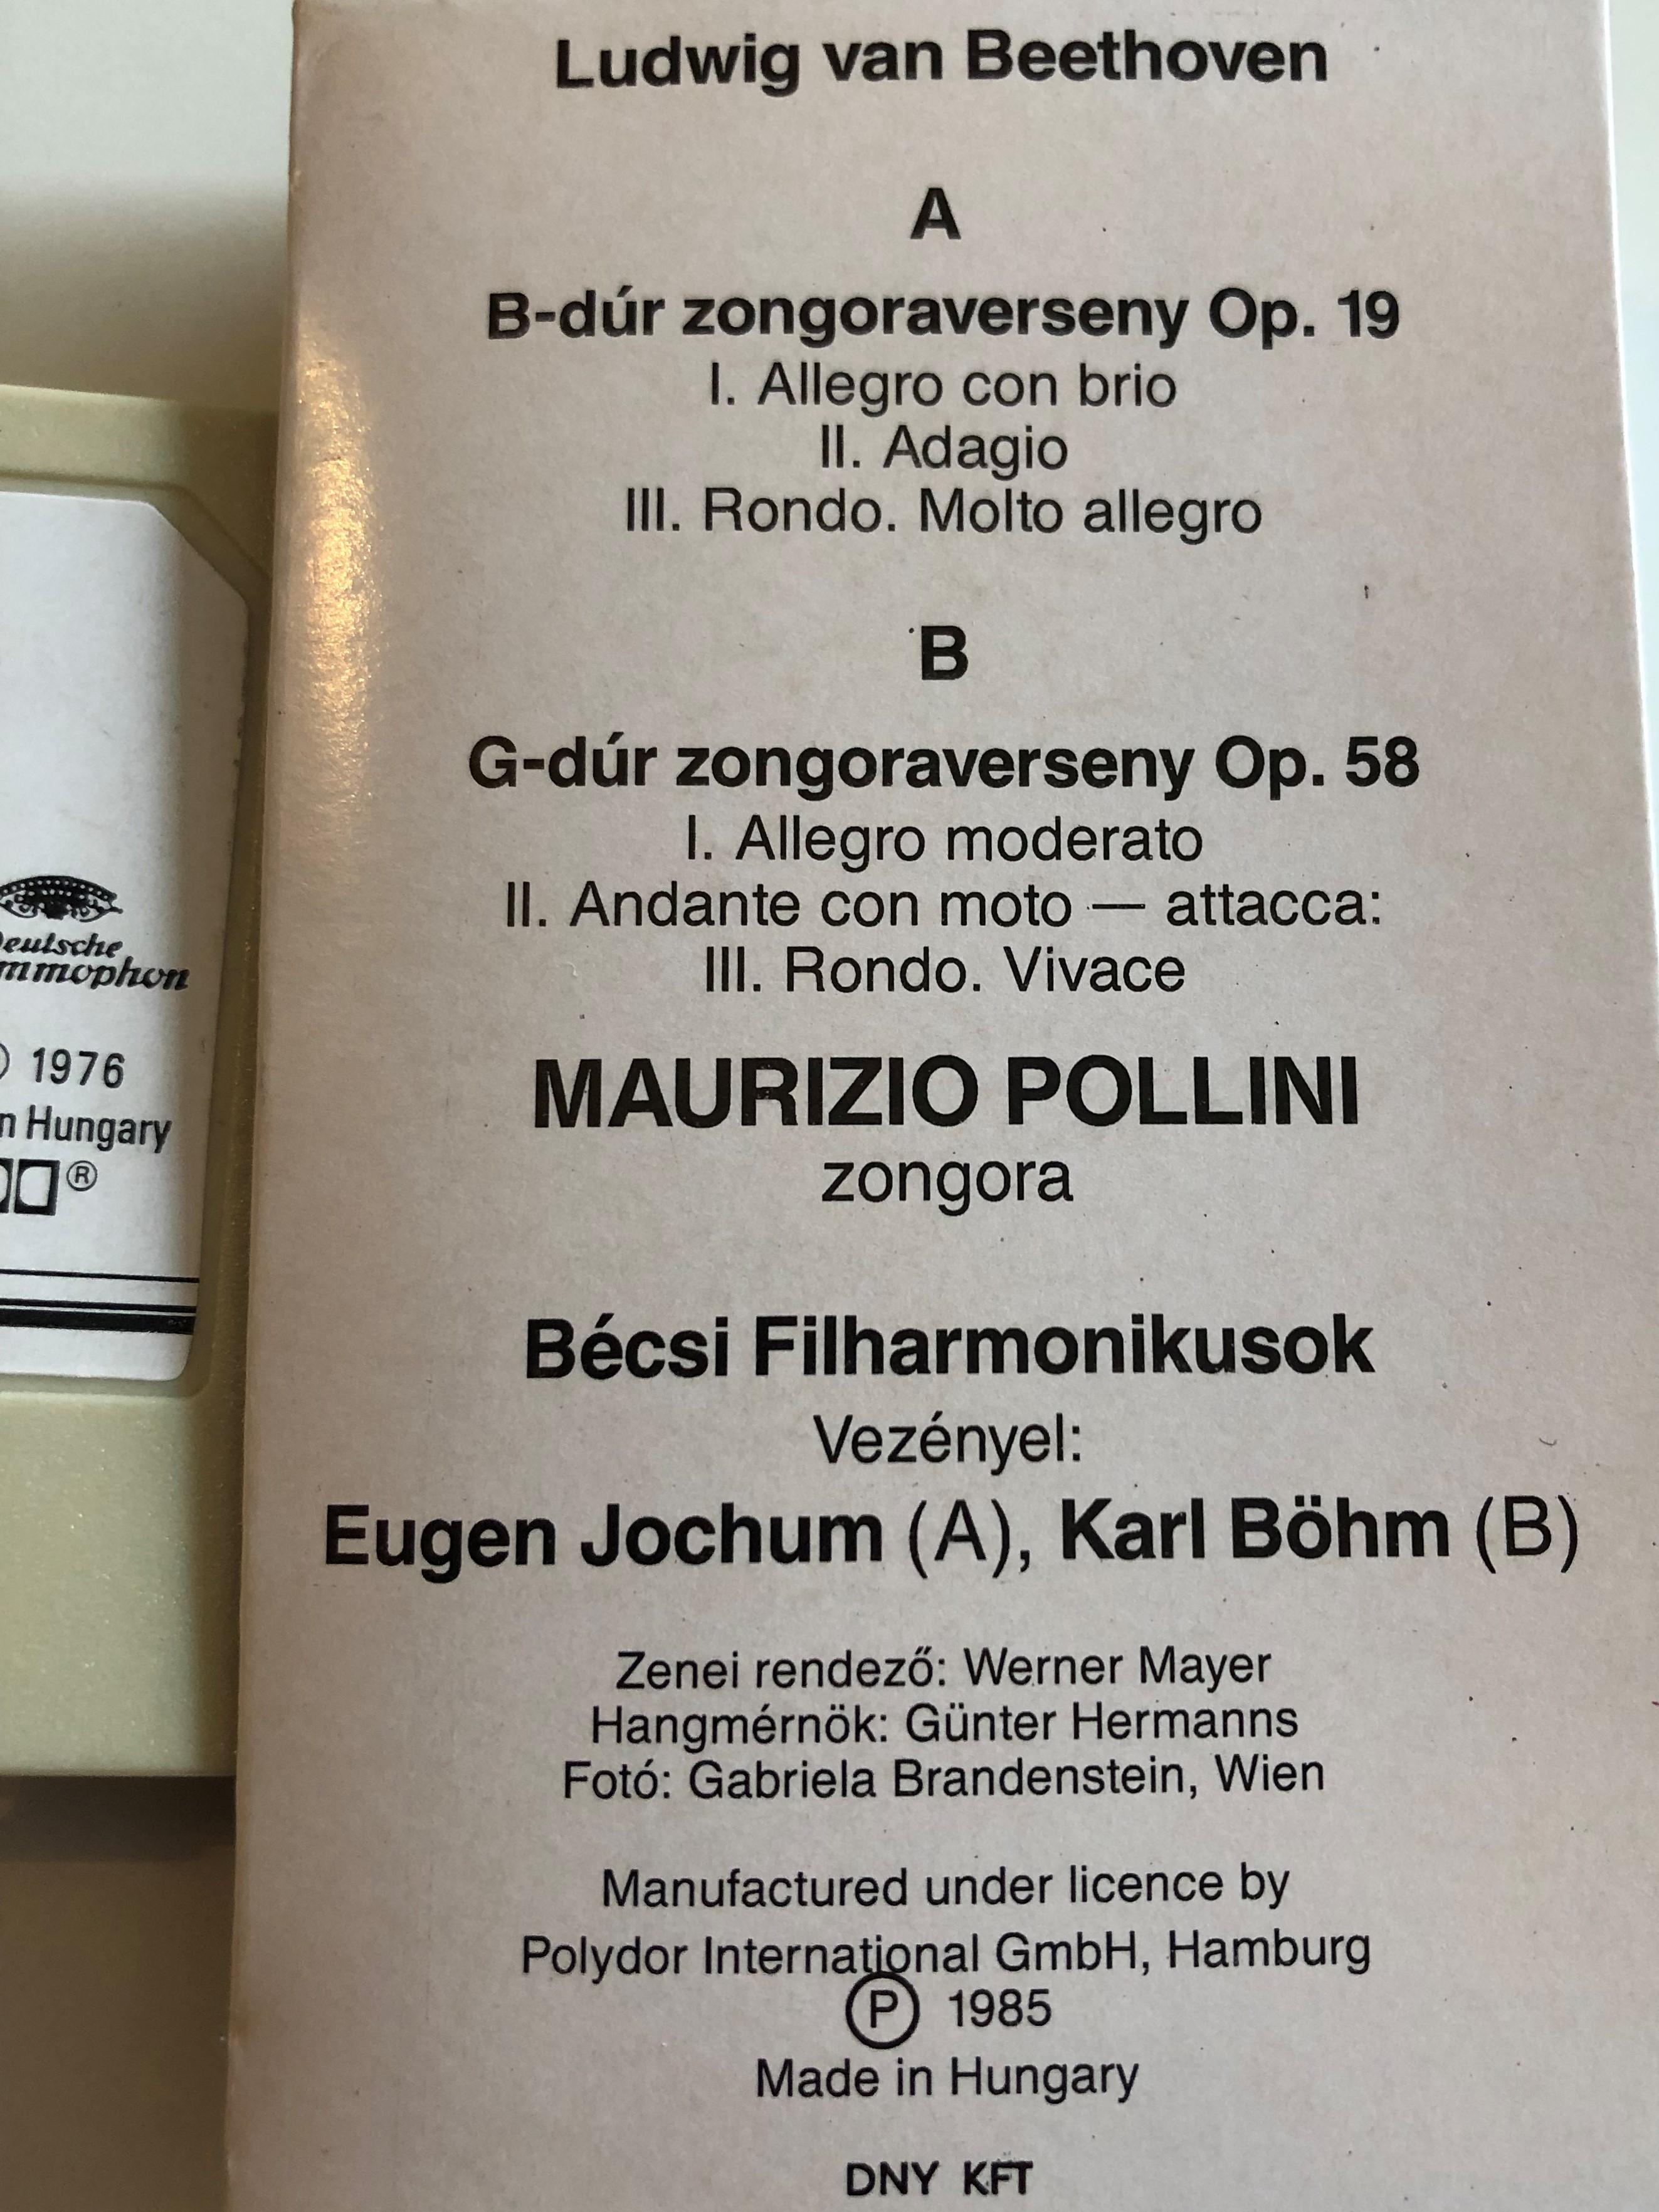 ludwig-van-beethoven-klavierkonzerte-piano-concertos-nos.-2-4-maurizio-pollini-wiener-philharmoniker-conducted-eugen-jochum-karl-b-hm-deutsche-grammophon-cassette-stereo-mkl-31221-3-.jpg